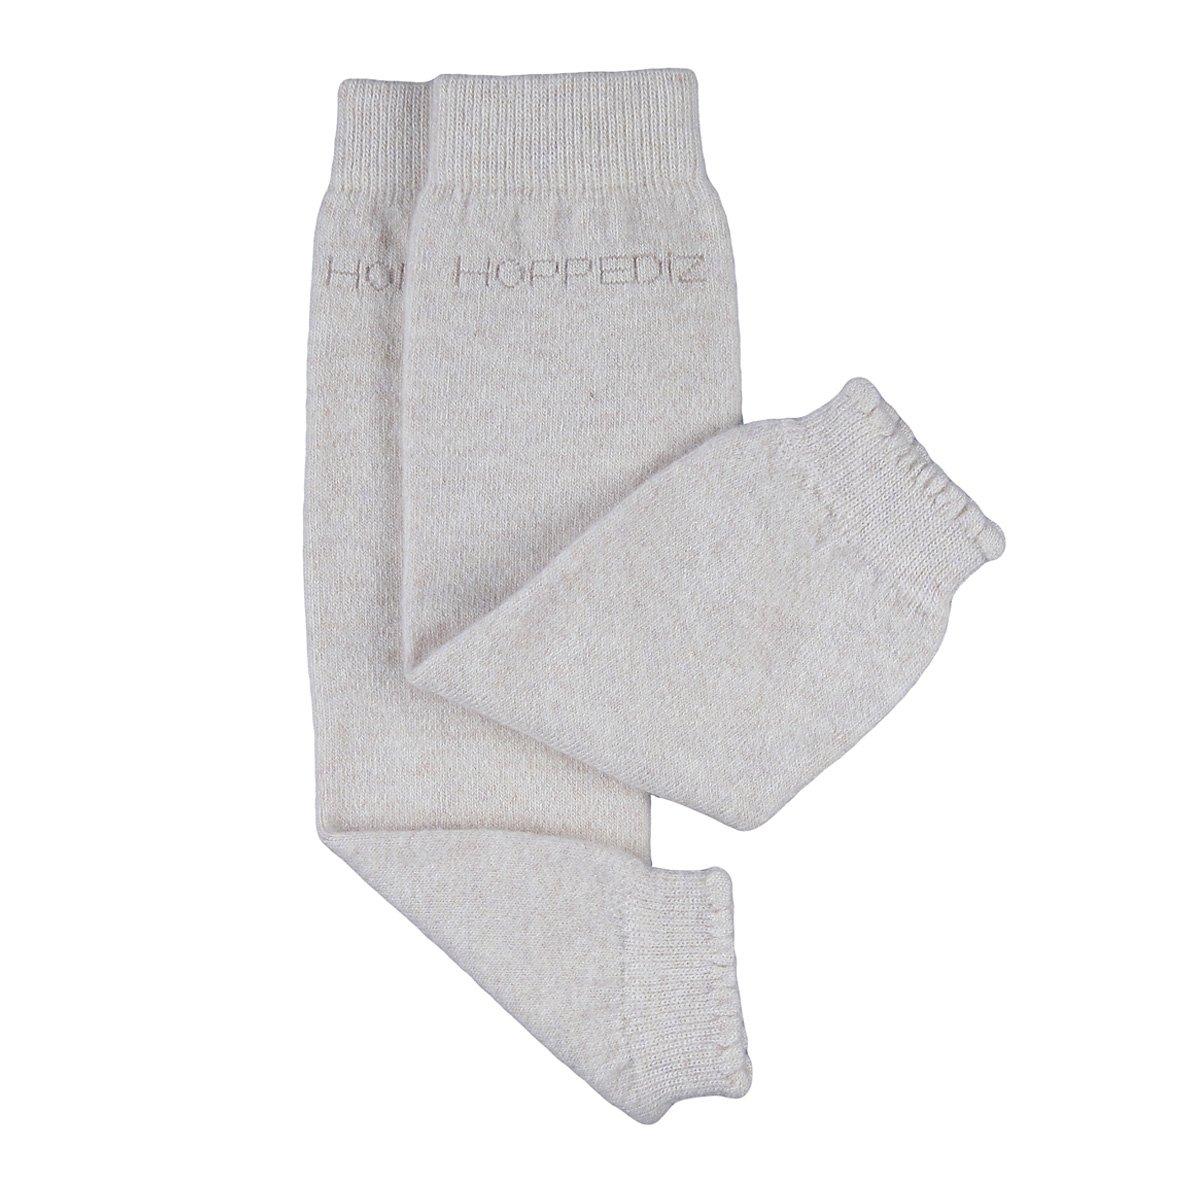 Calentadores para piernas Hoppedizde cachemira y lana merino para bebés, color crema HOPPEDIZ GmbH & Co. KG Stk-cre